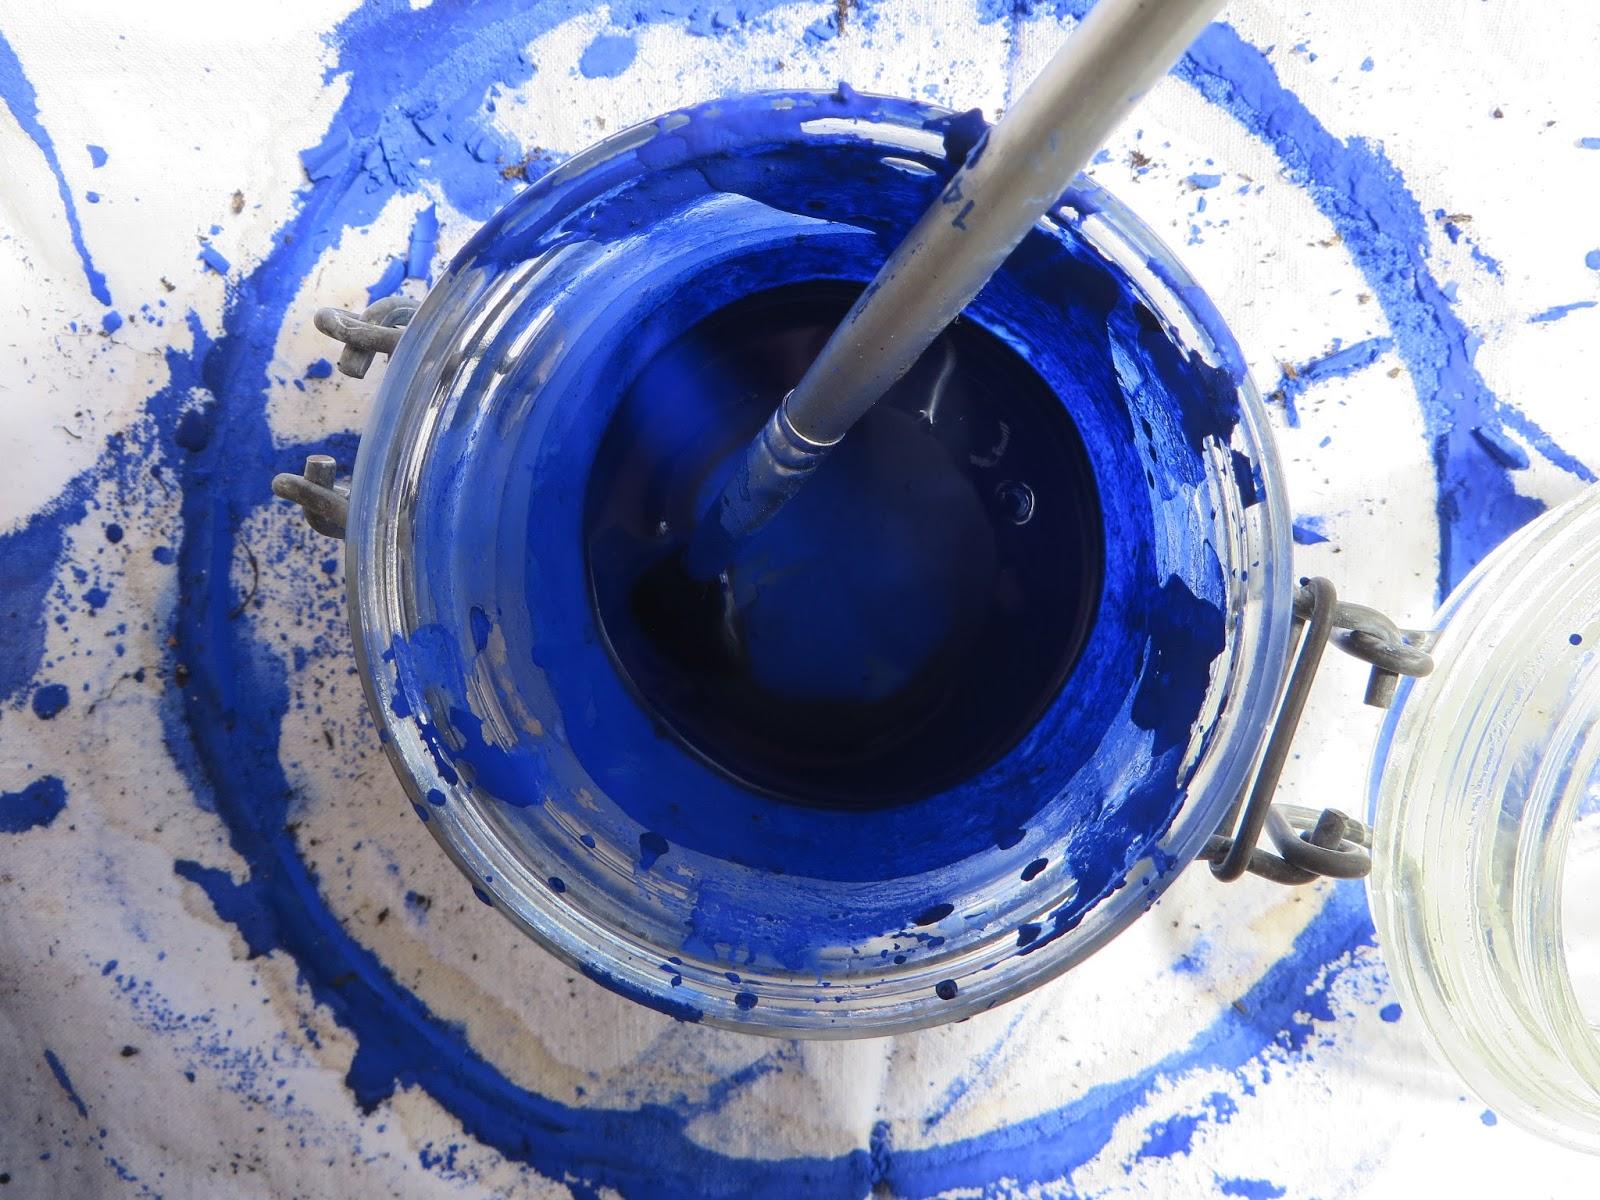 Bleu Klein Peinture Acheter